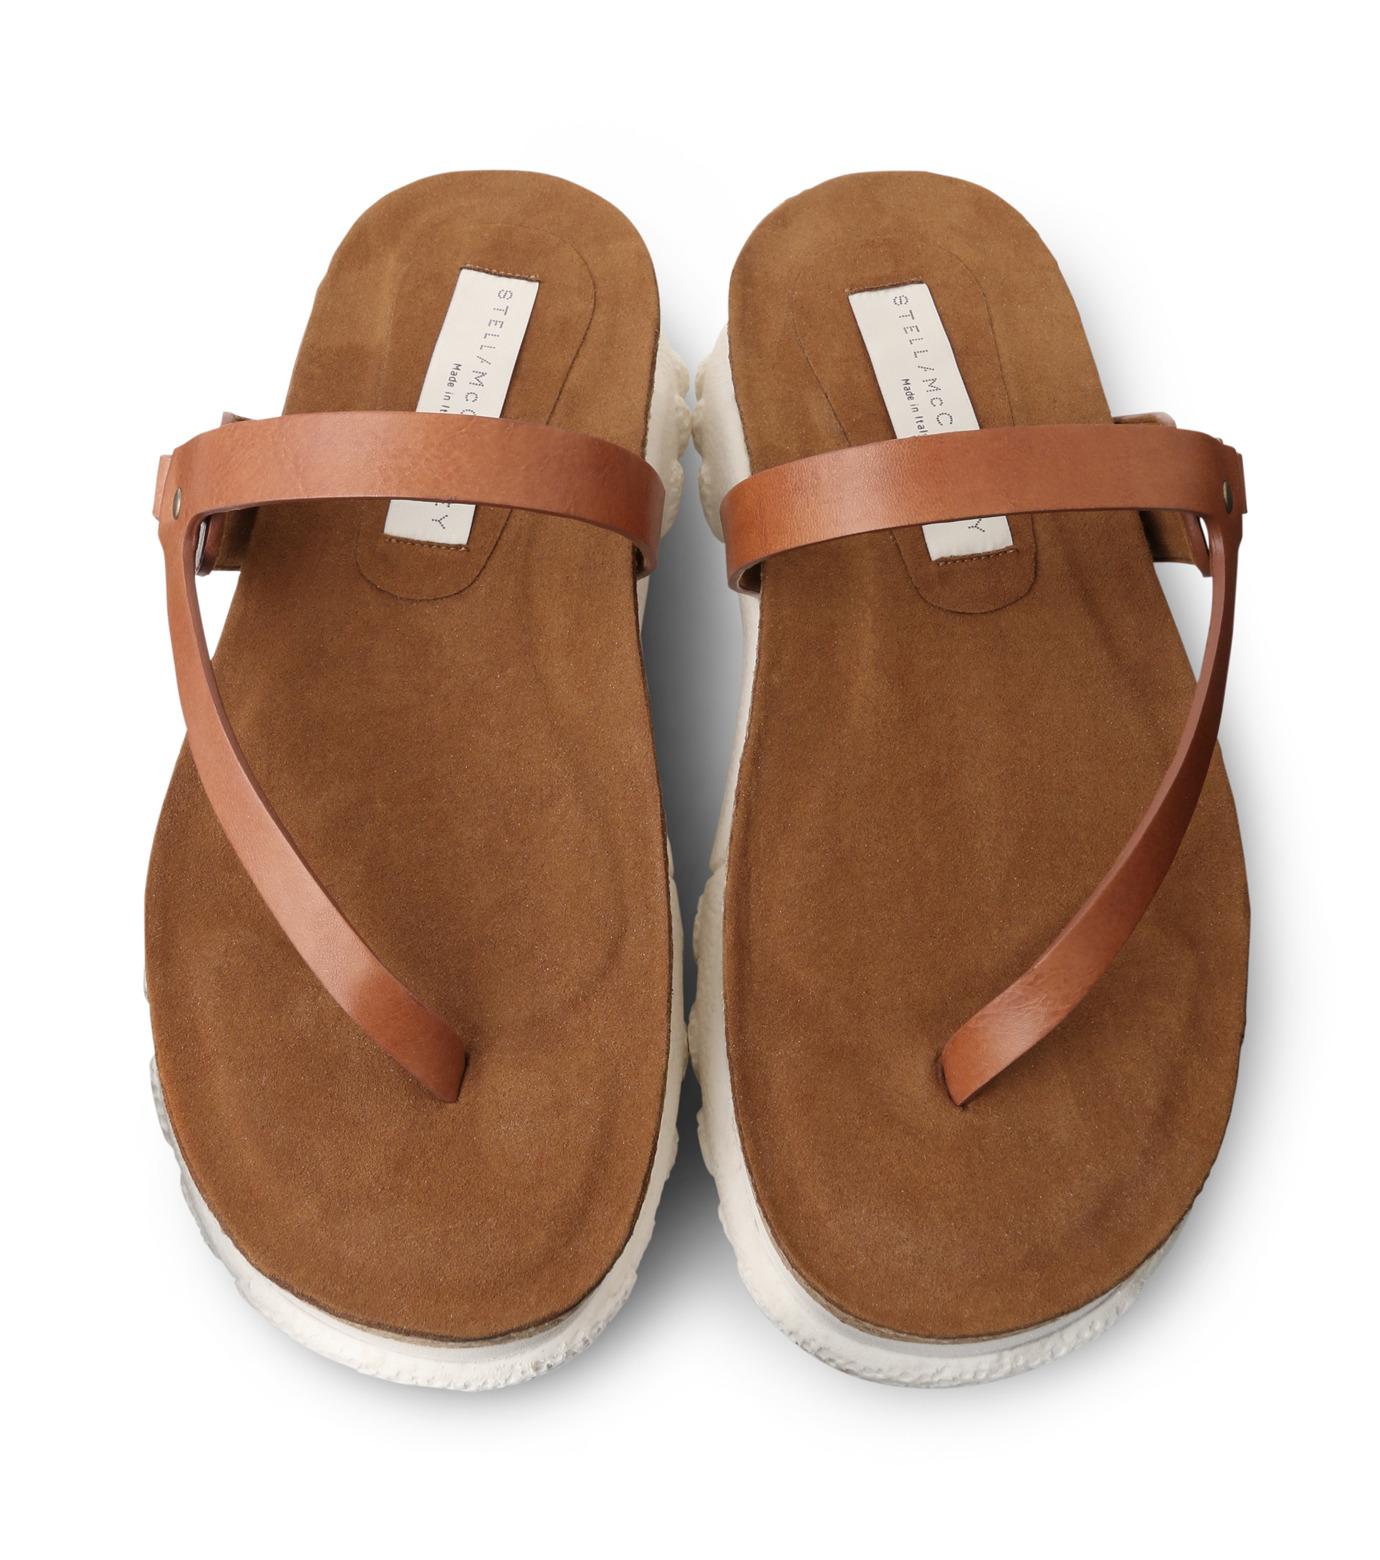 Stella McCartney(ステラマッカートニー)のSneaker Sandal-BROWN(シューズ/shoes)-423387-W0MW0-42 拡大詳細画像4